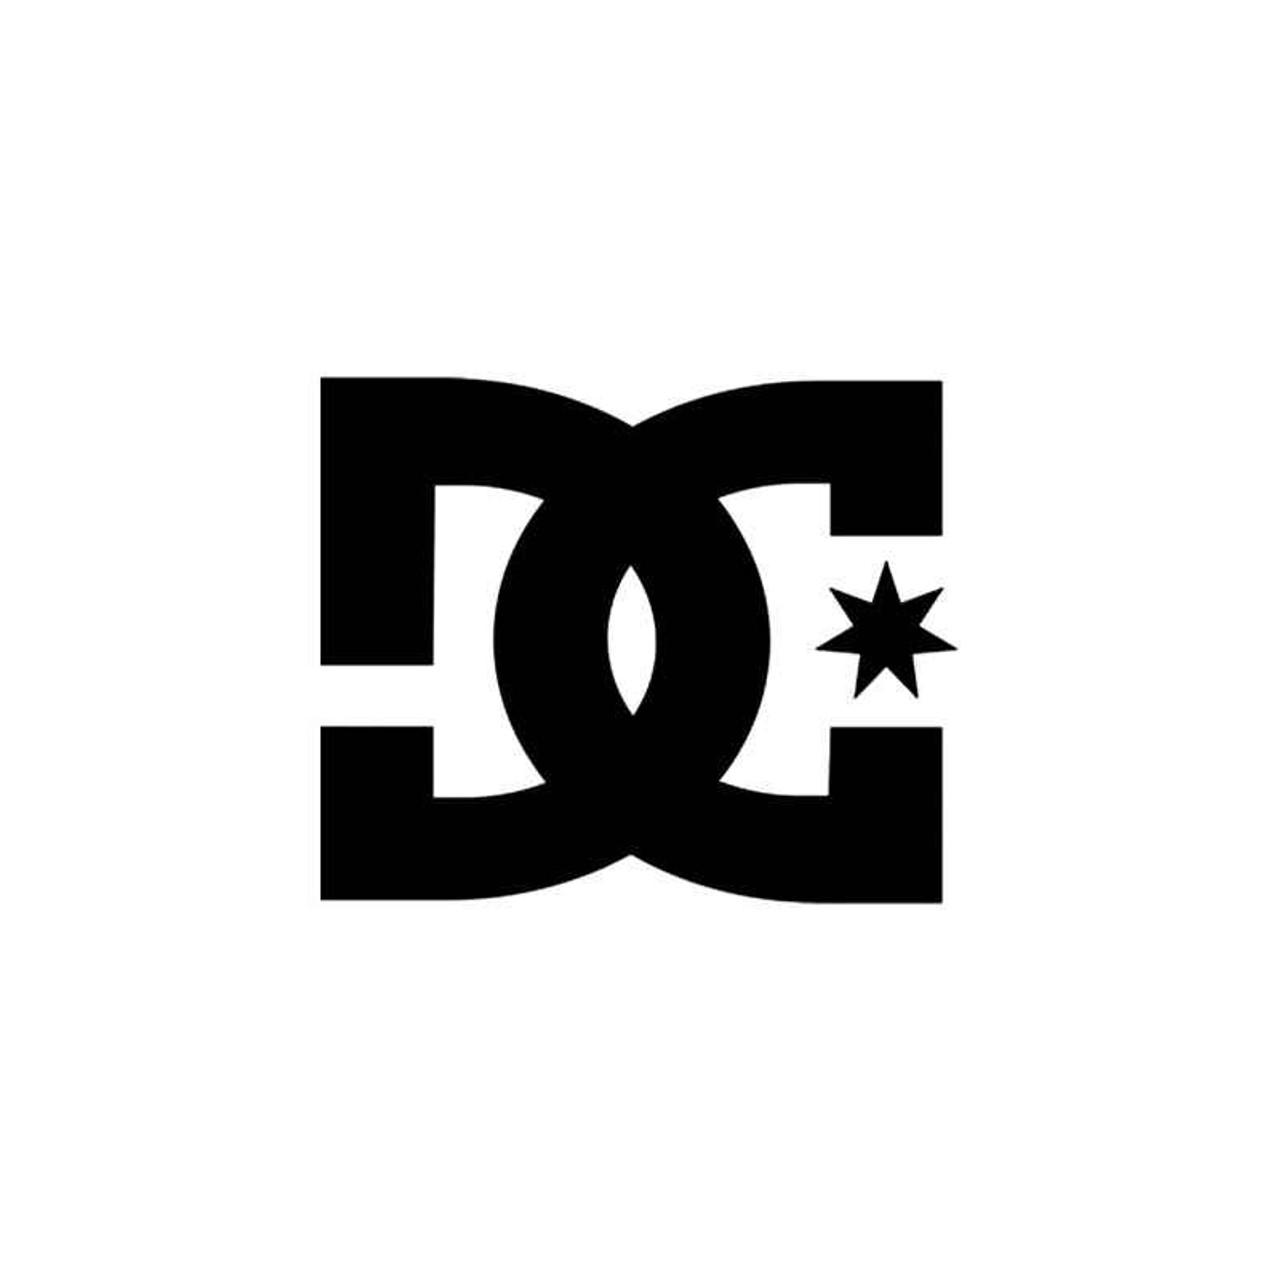 1bccc70fe2 Corporate Logo s Dc Shoes Style 1 Vinyl Sticker